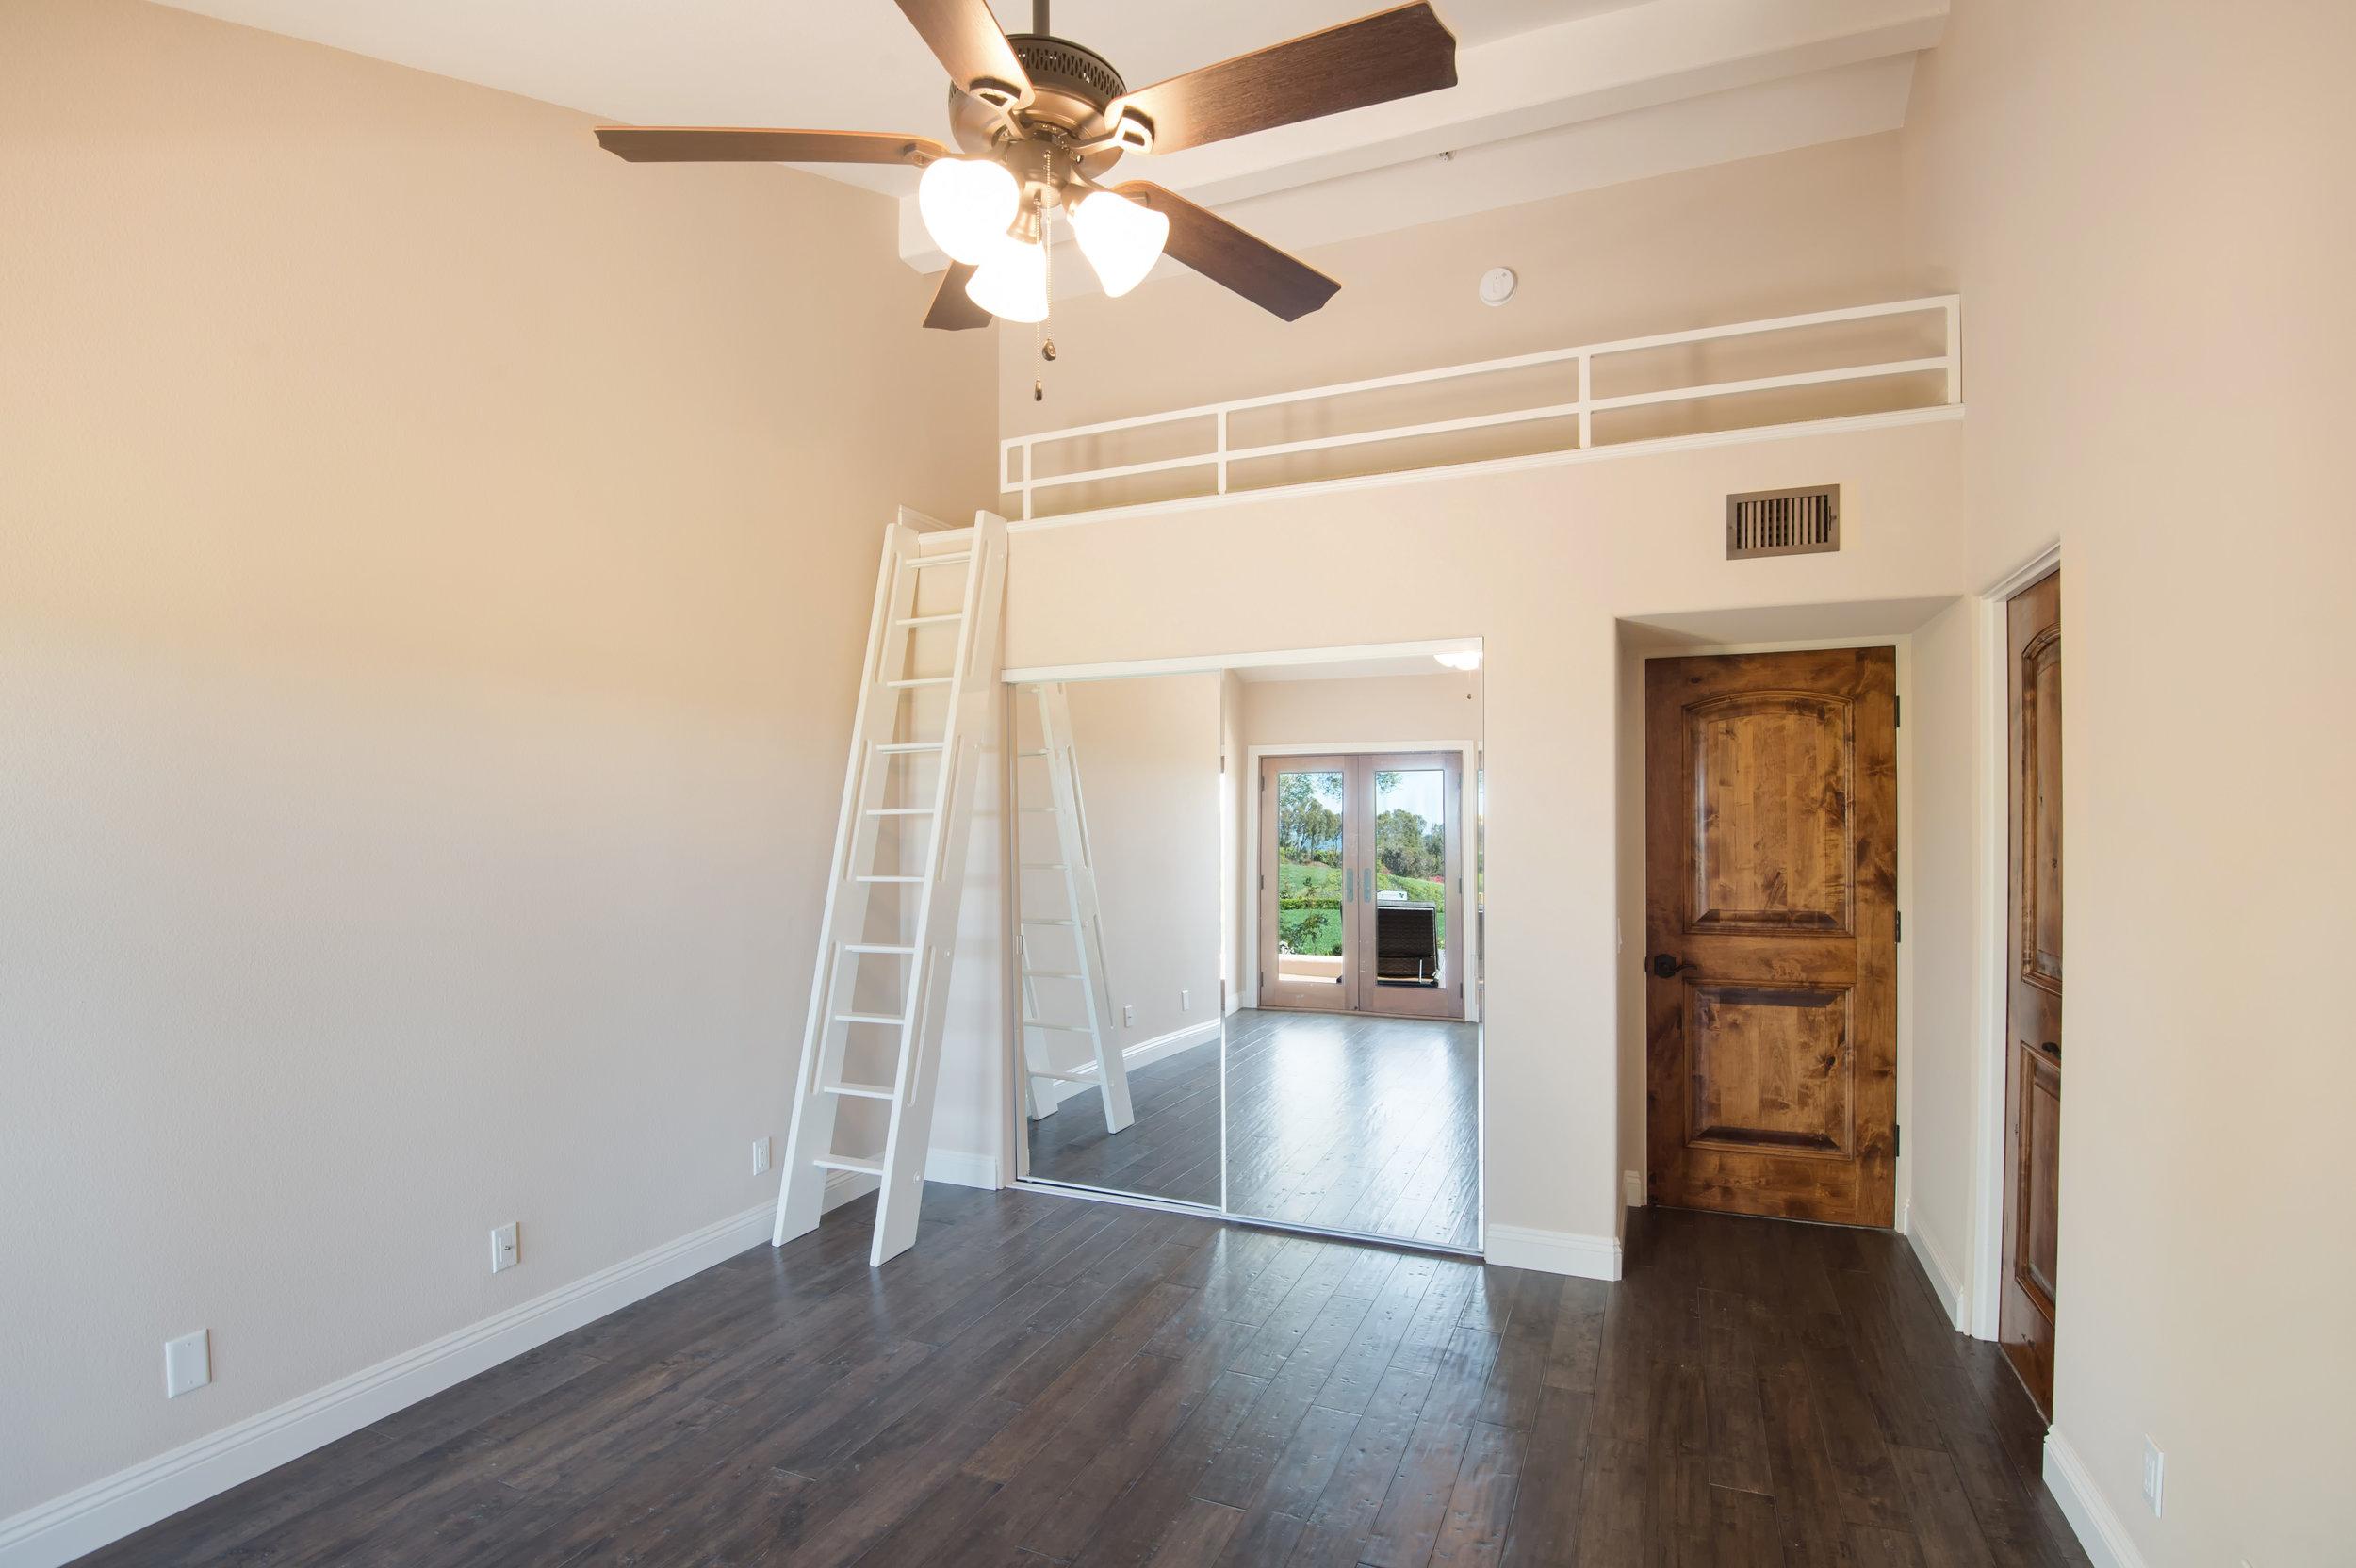 016 6130 Via Cabrillo For Sale Lease The Malibu Life Team Luxury Real Estate.jpg